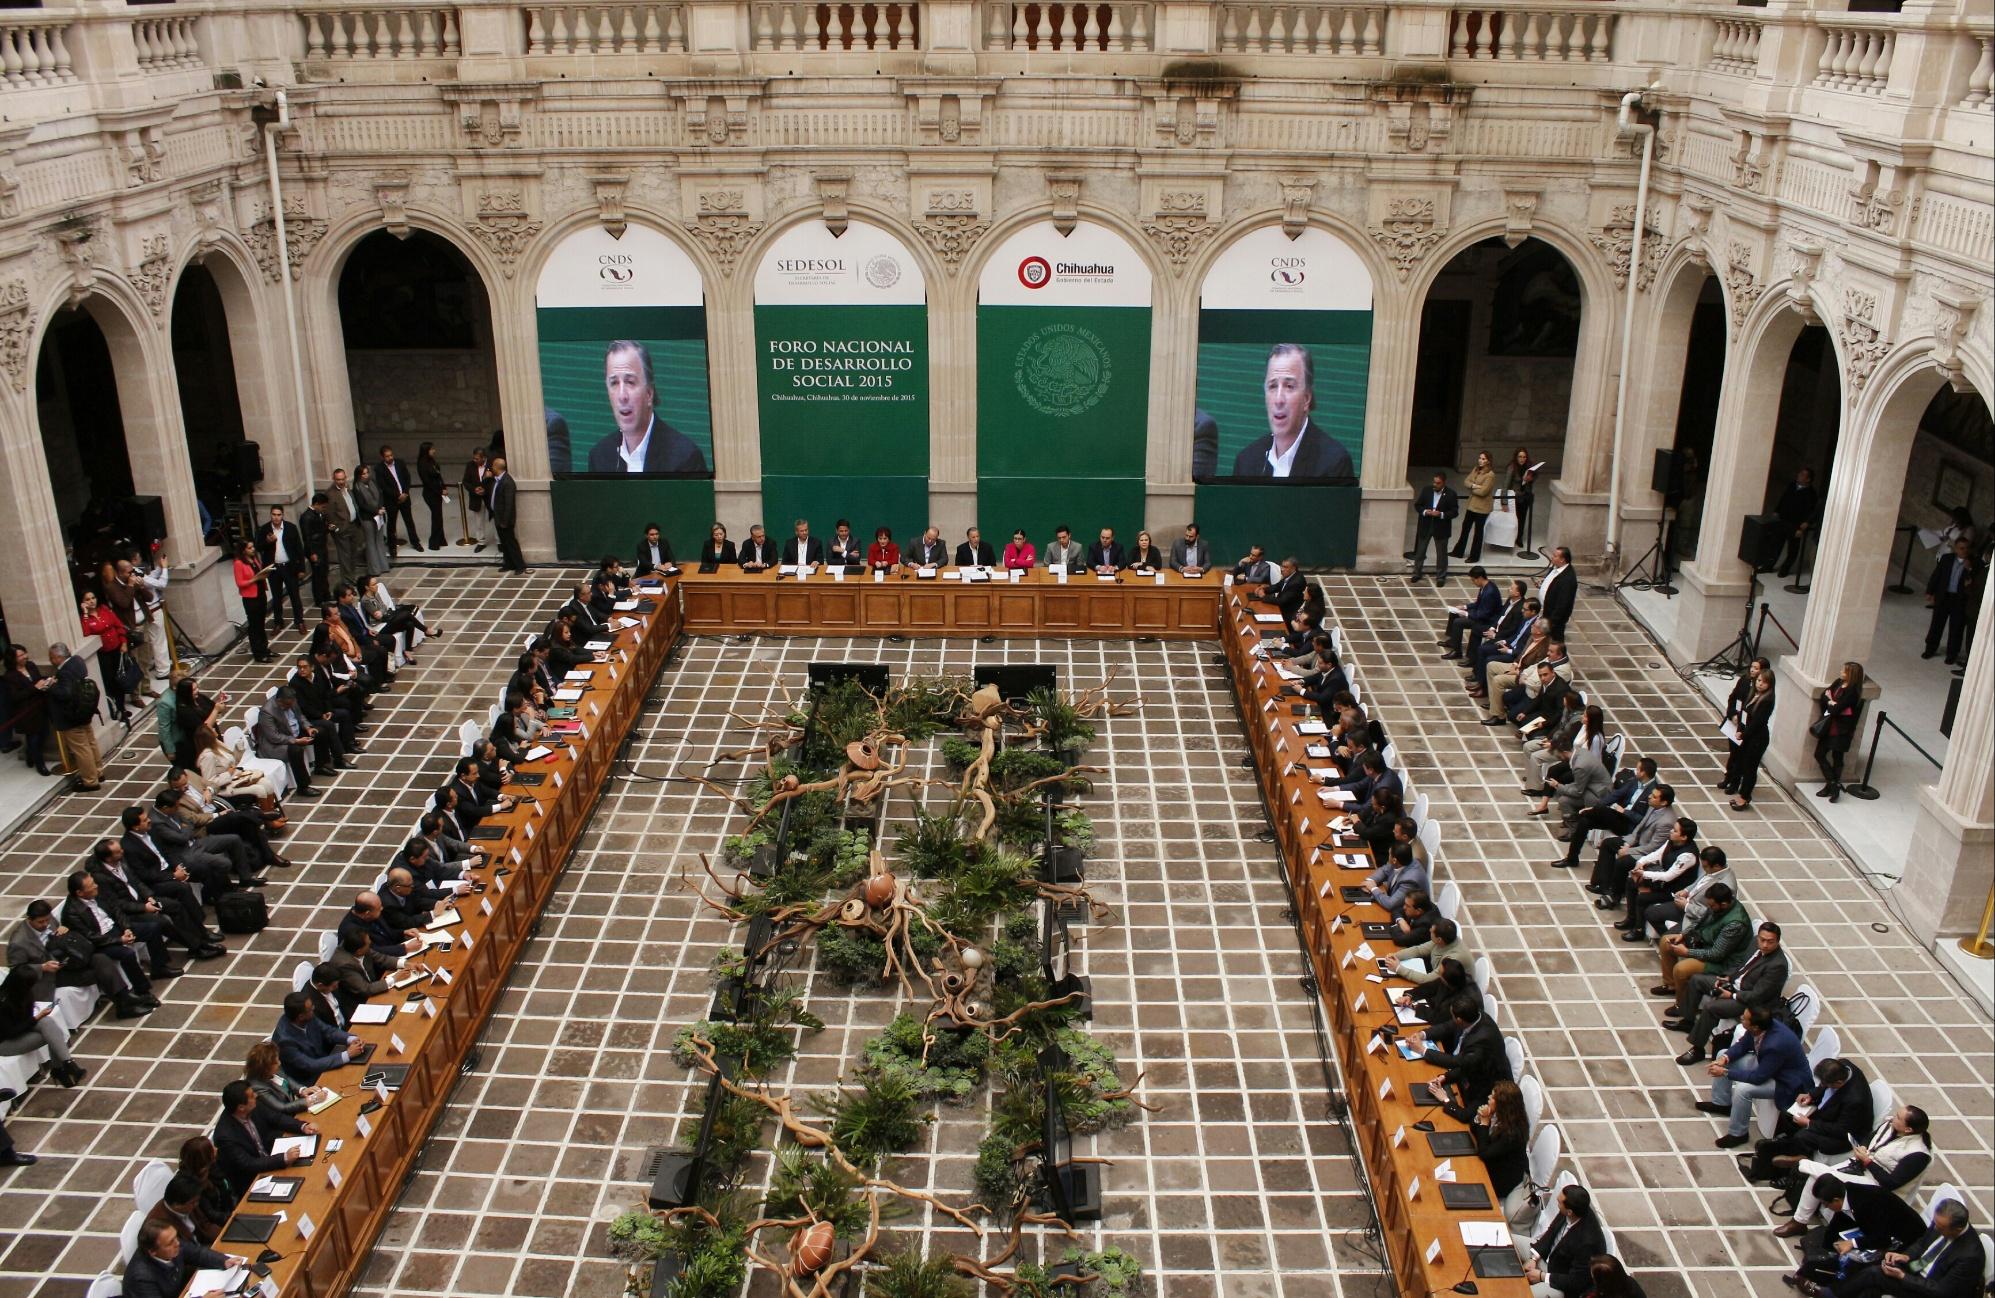 FOTO 3 Secretario Meade durante la inauguraci n de la Segunda Sesi n Ordinaria 2015 de la CNDS.jpg